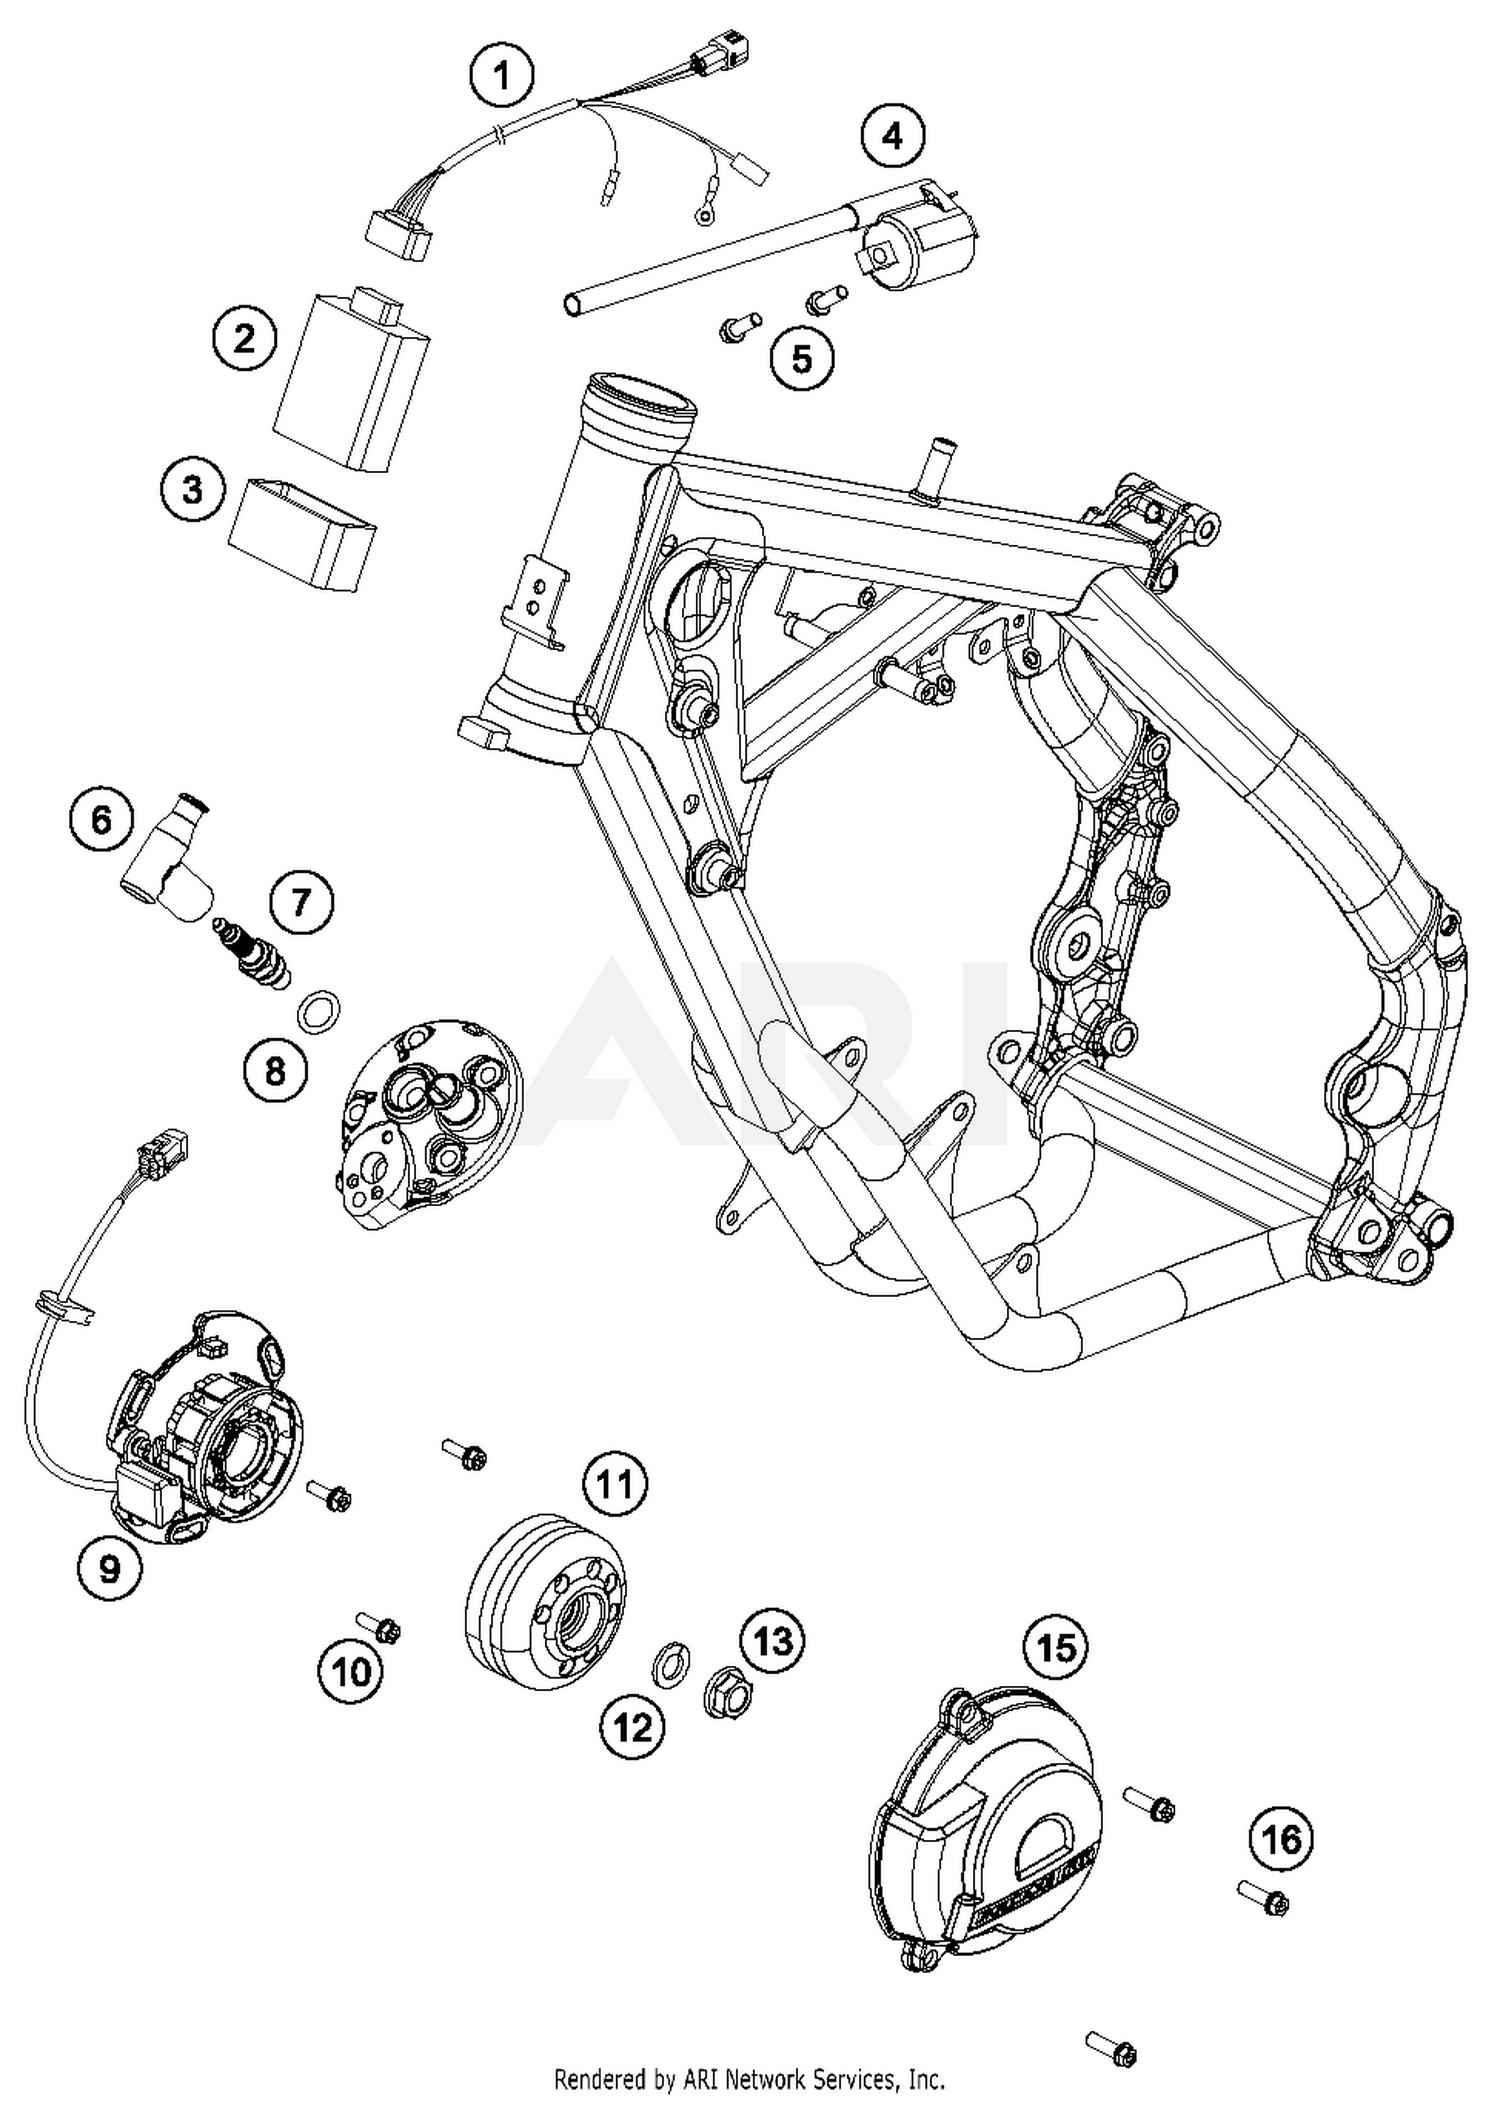 2018 ktm 65 sx mini ignition system parts - best oem ignition system parts  diagram for 2018 65 sx mini motorcycles  bike bandit